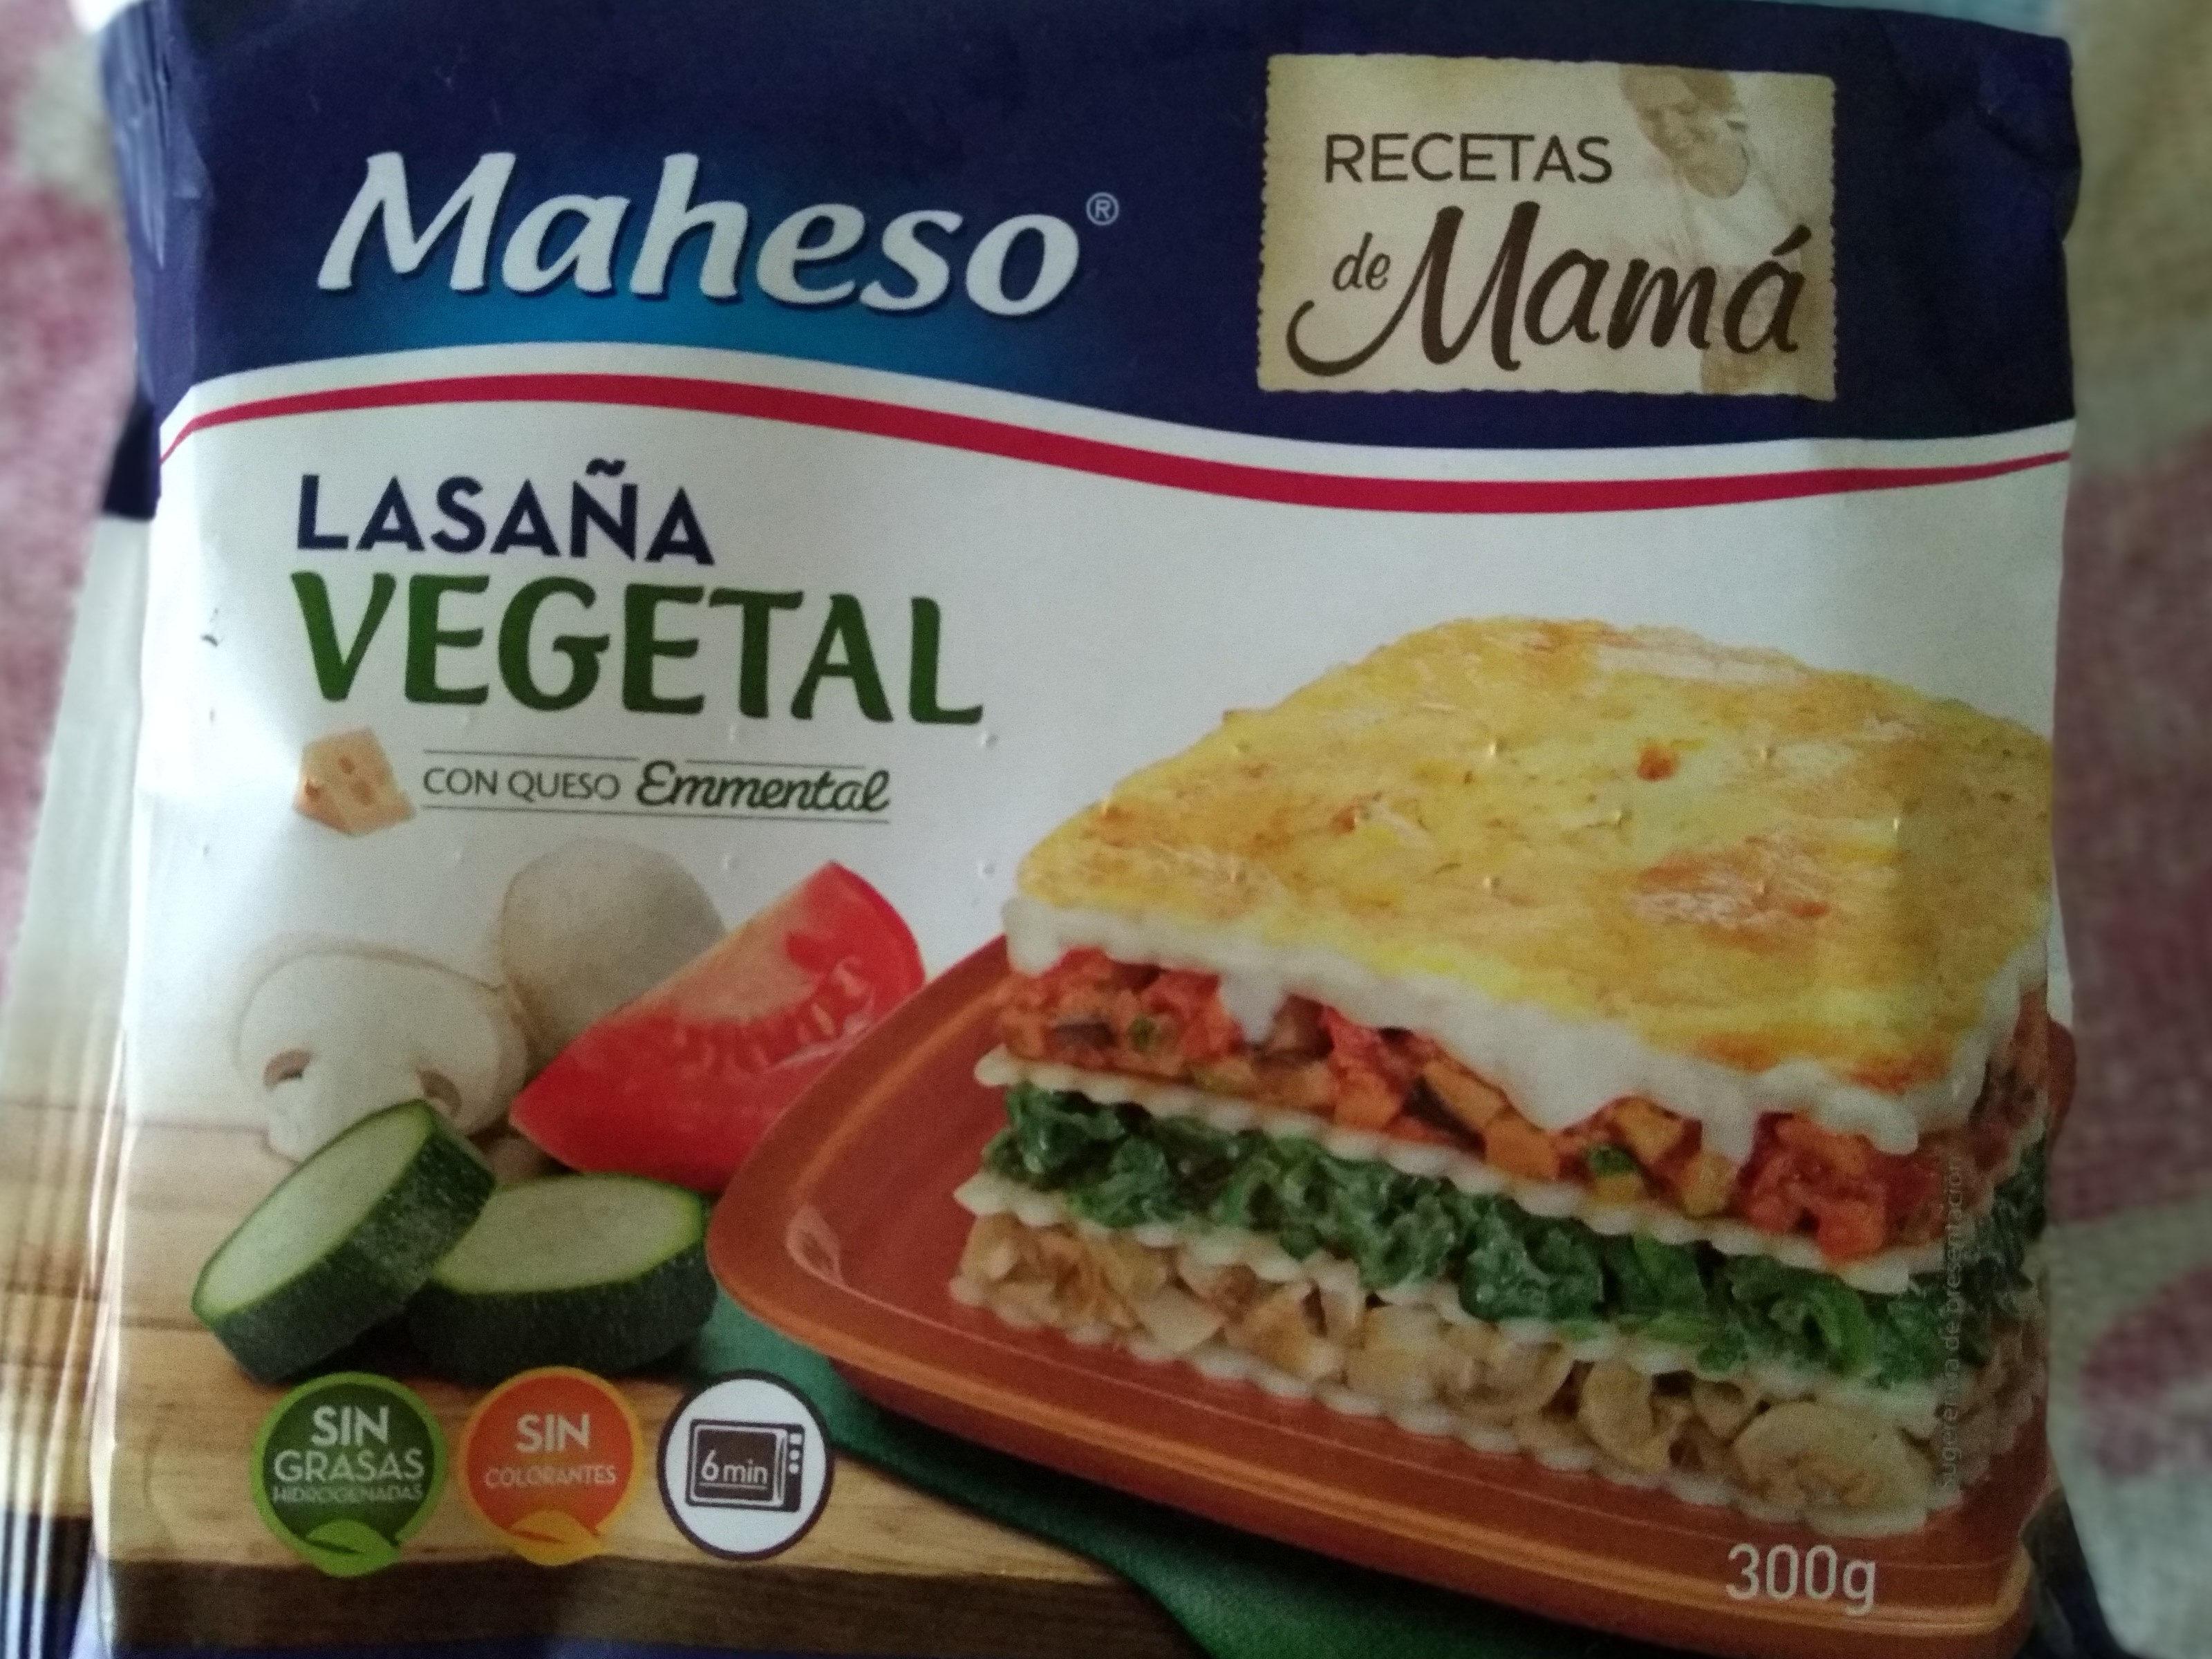 Lasaña vegetal - Product - es